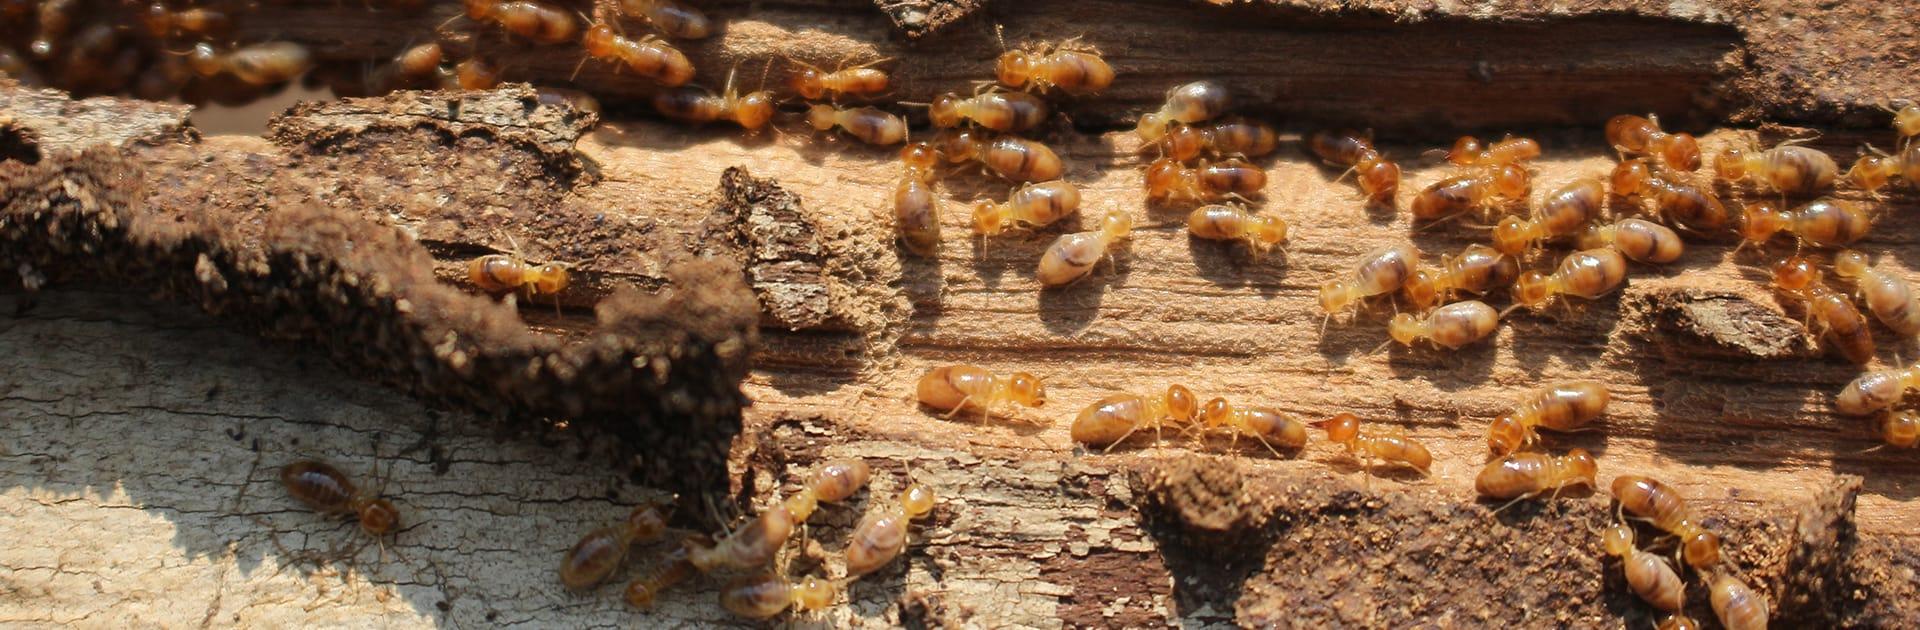 subterrenean termites eating wood